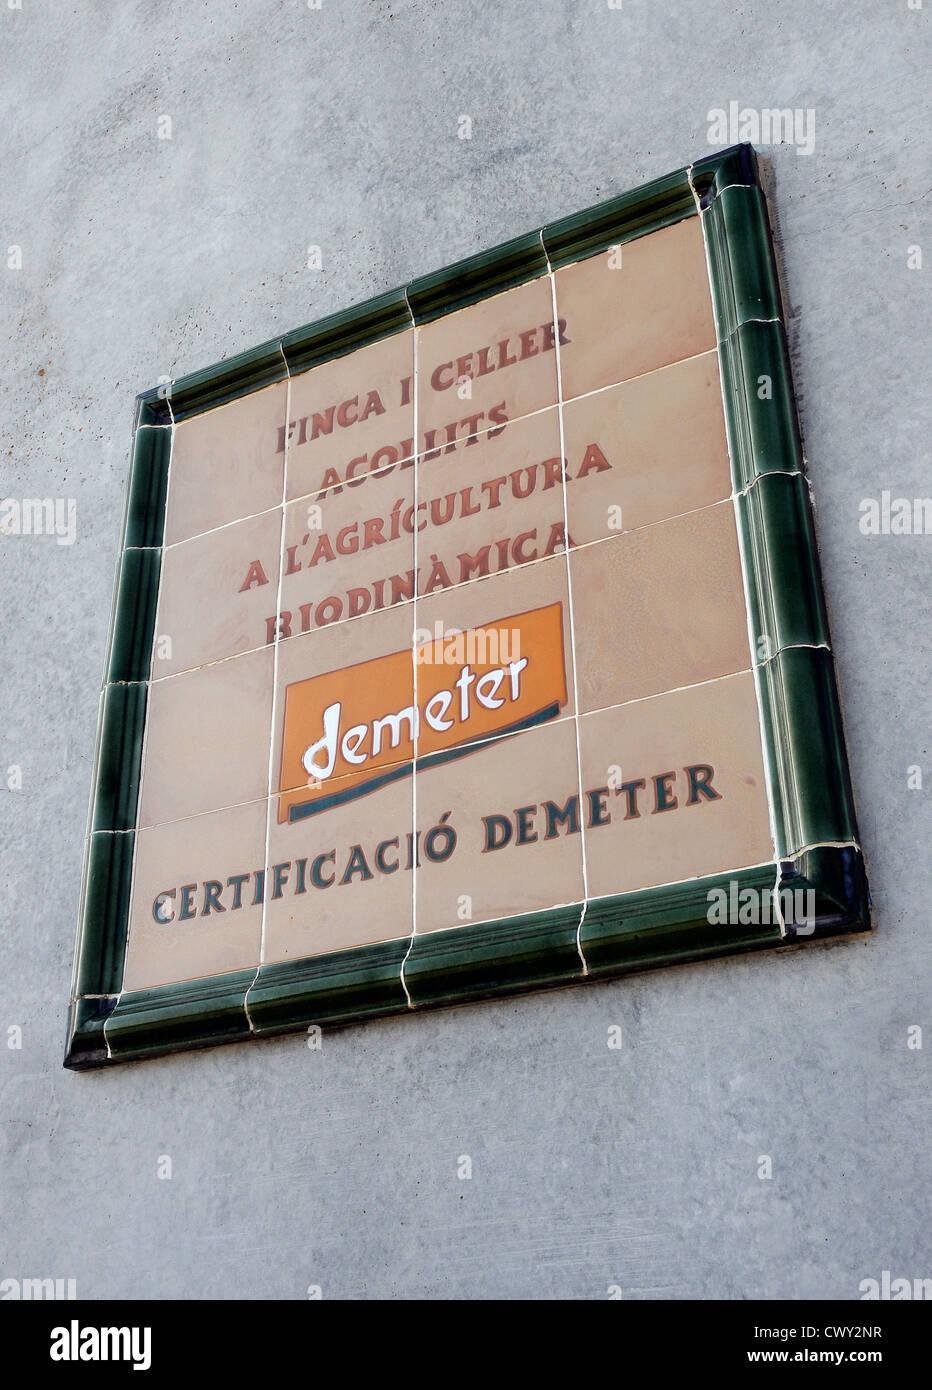 certificate of Demeter. Organic farming, biodynamics avoids chemical fertilizers and pesticide treatments.Priorat - Stock Image